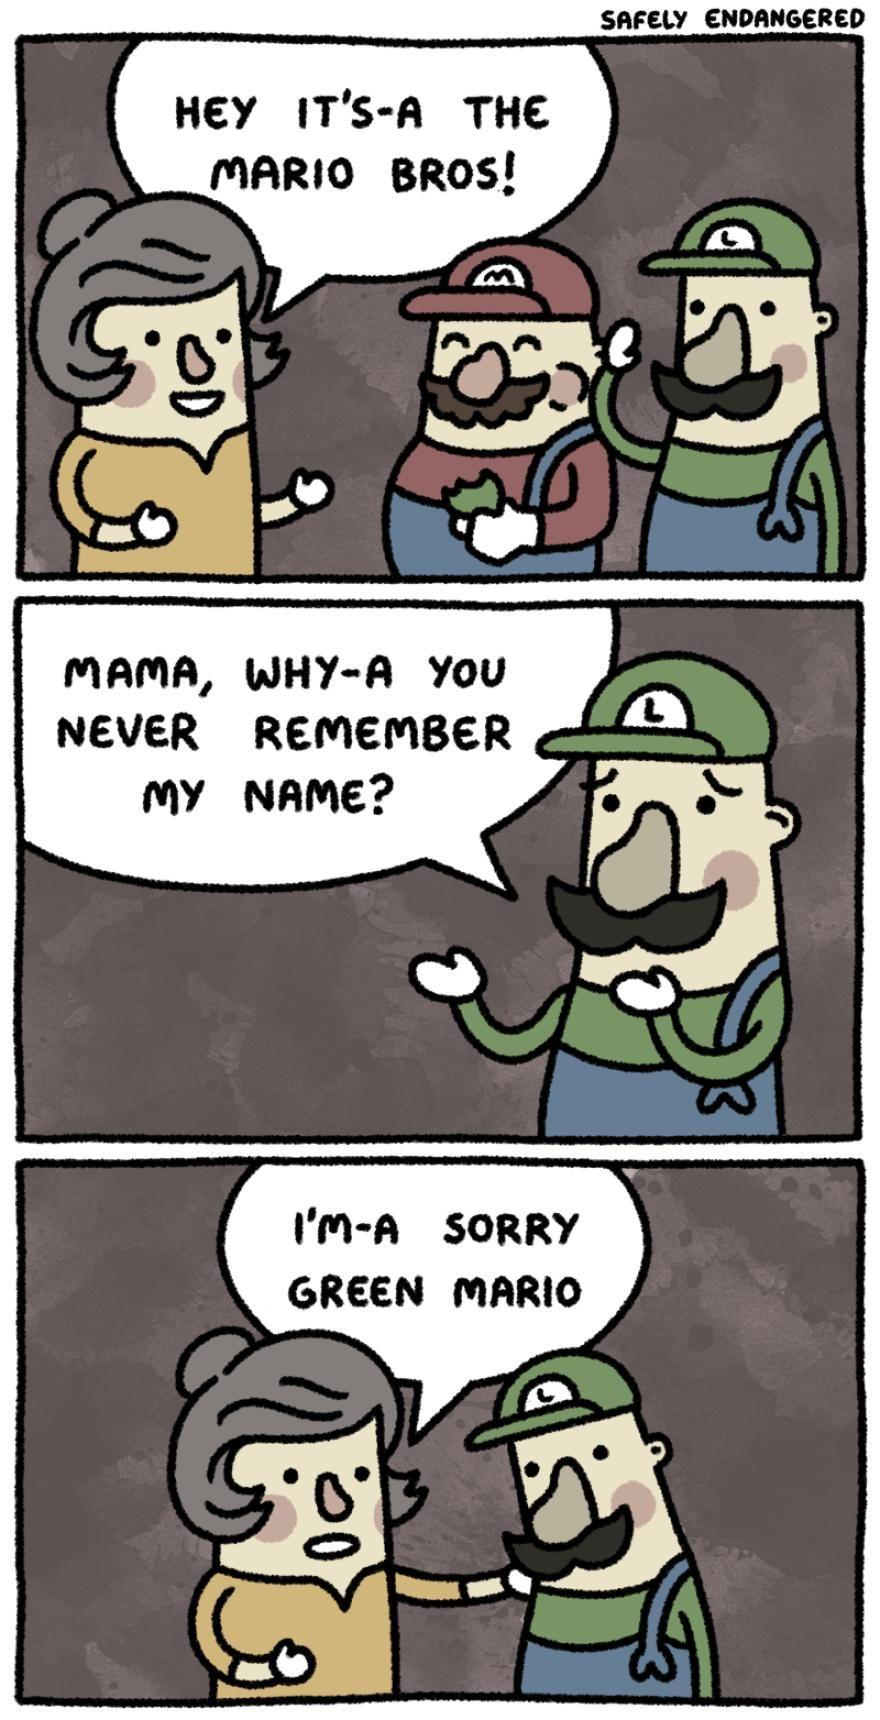 Poor green mario